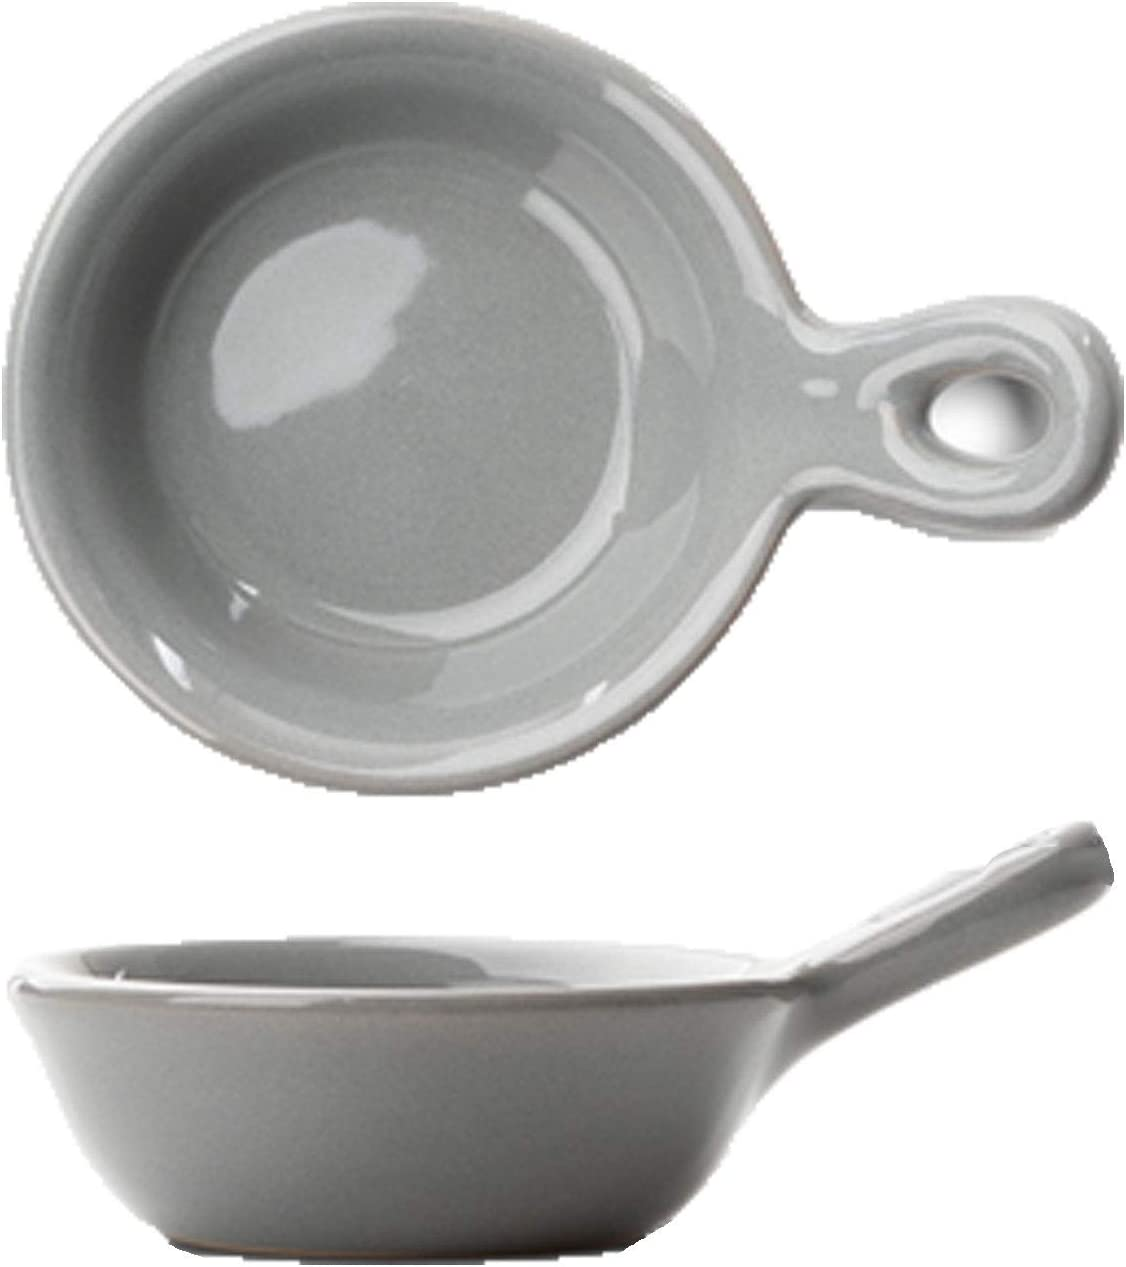 Sauce Max 57% OFF Dish Dipping Under blast sales Bowls Set Multipurpose Bowl Dishes Porcelain